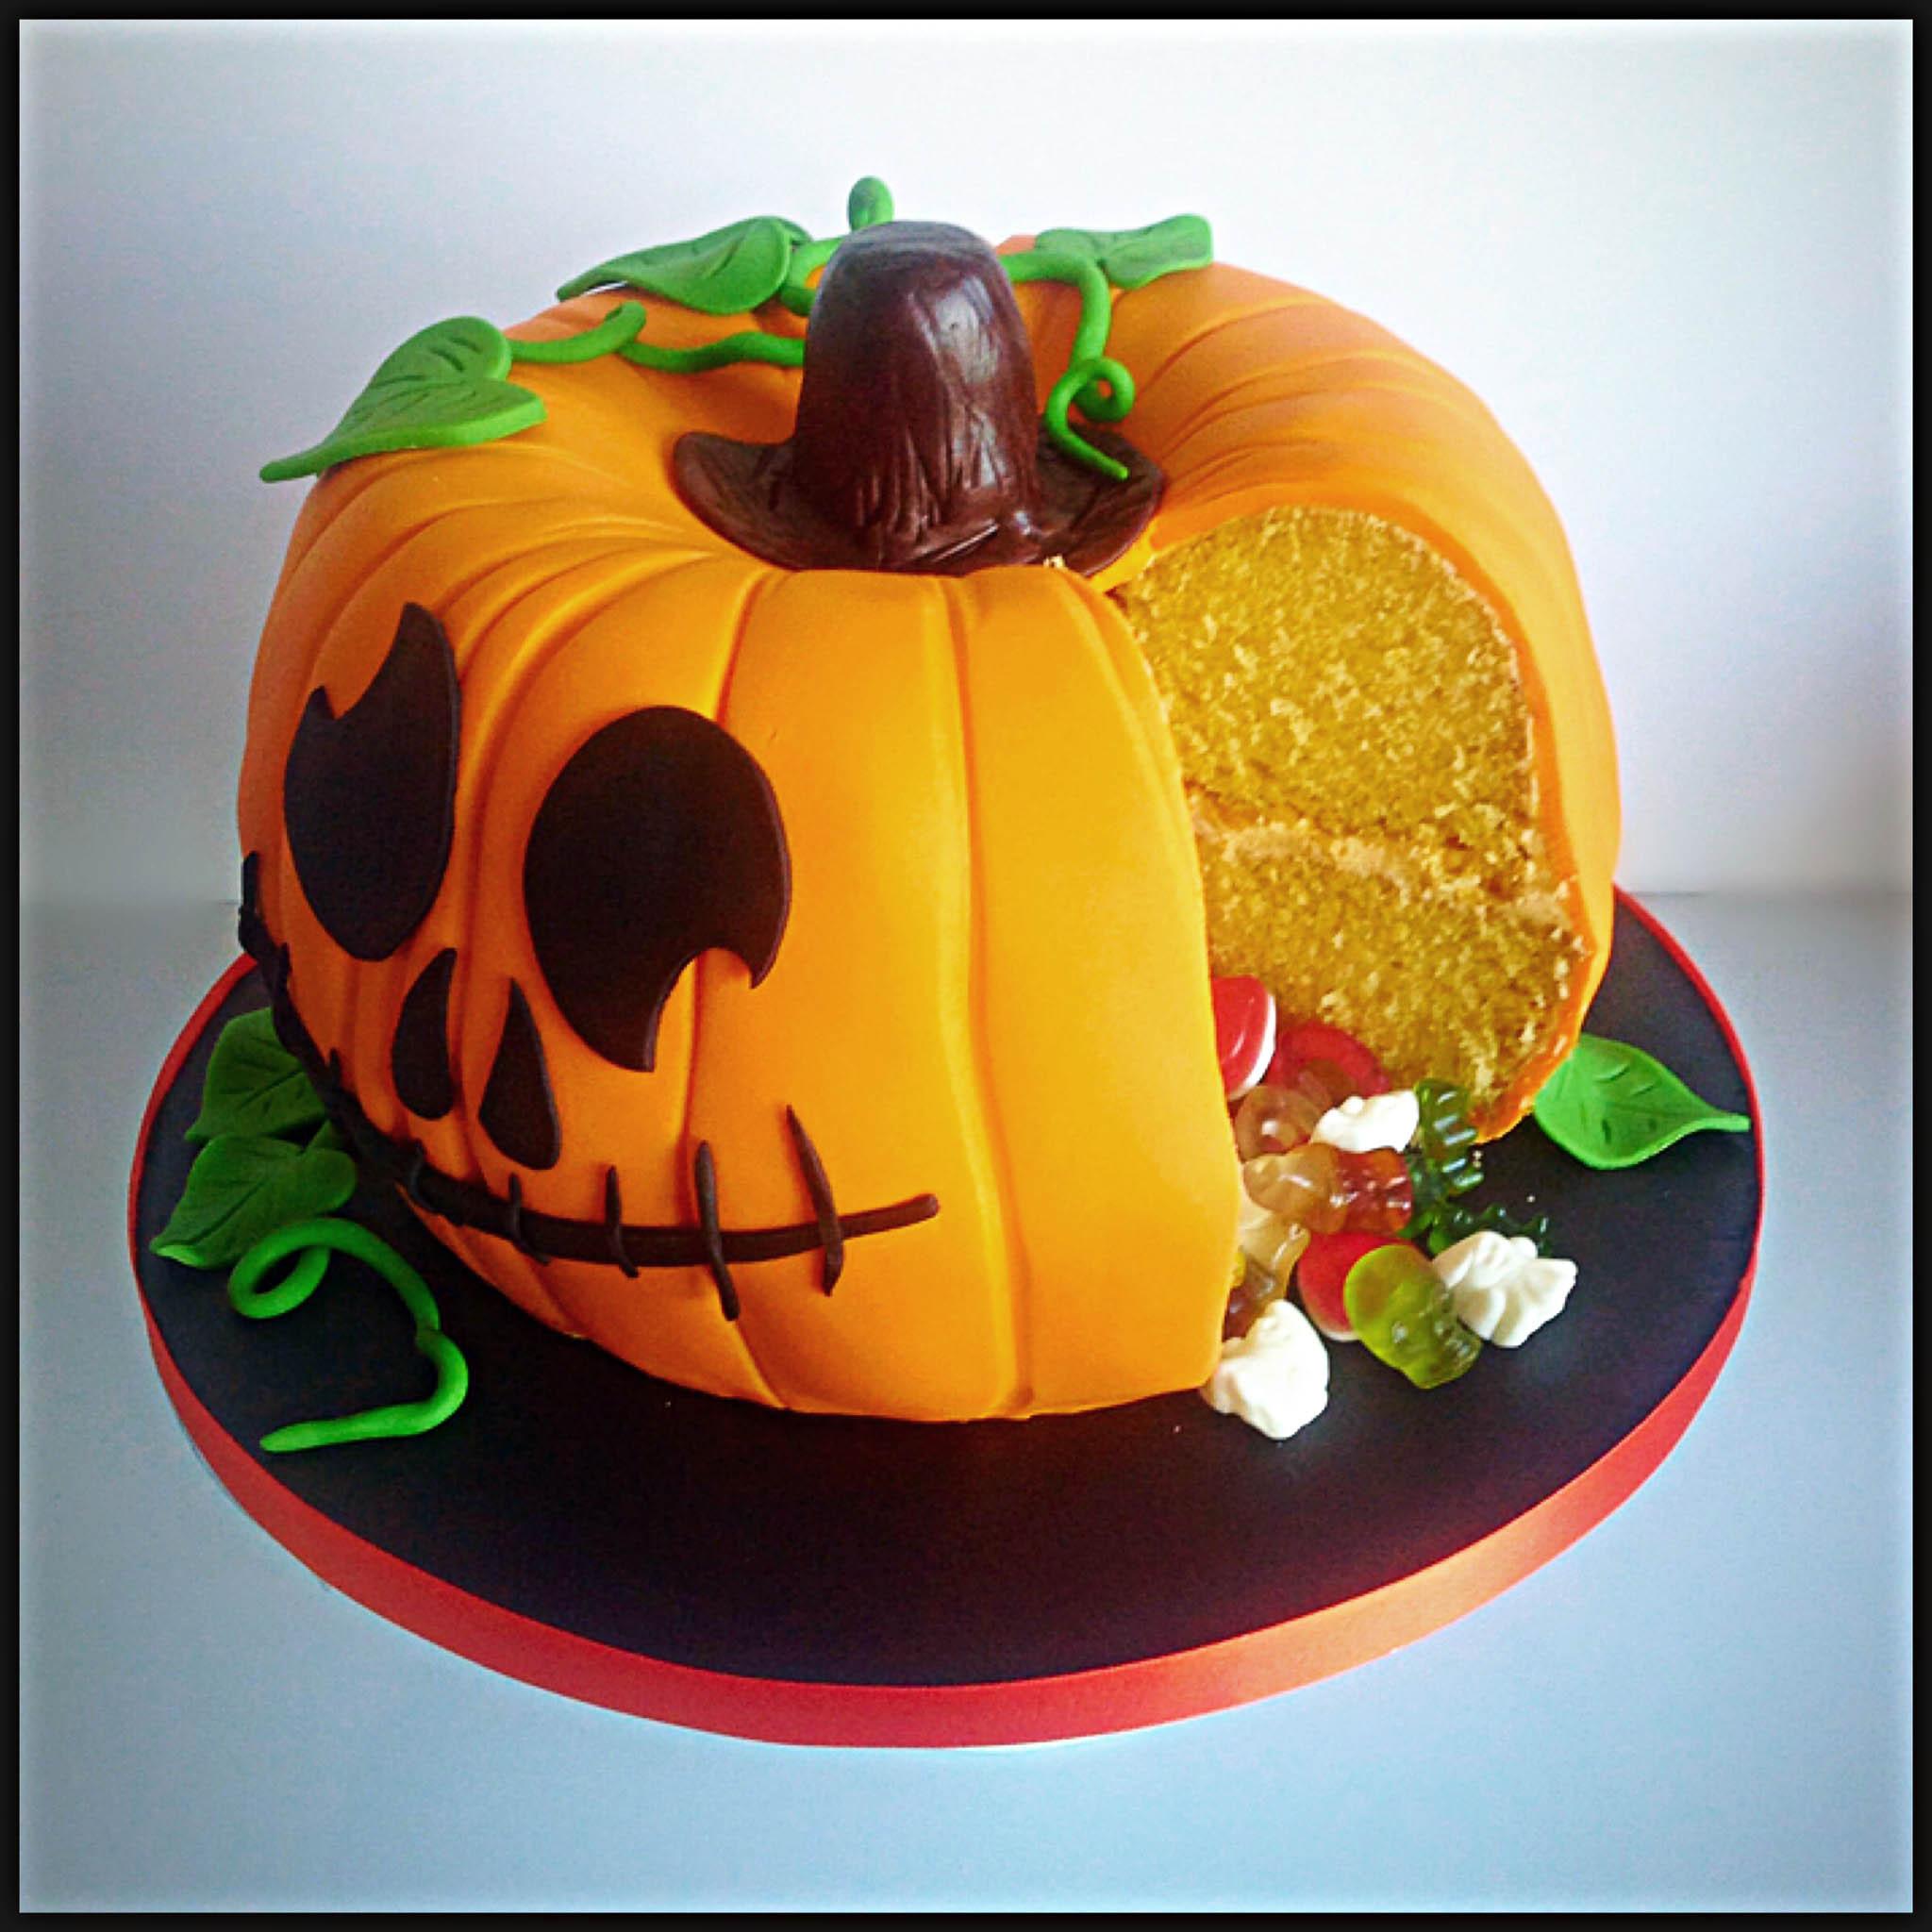 Halloween Pumpkin Cake  How To Make A Party Pumpkin Piñata Cake